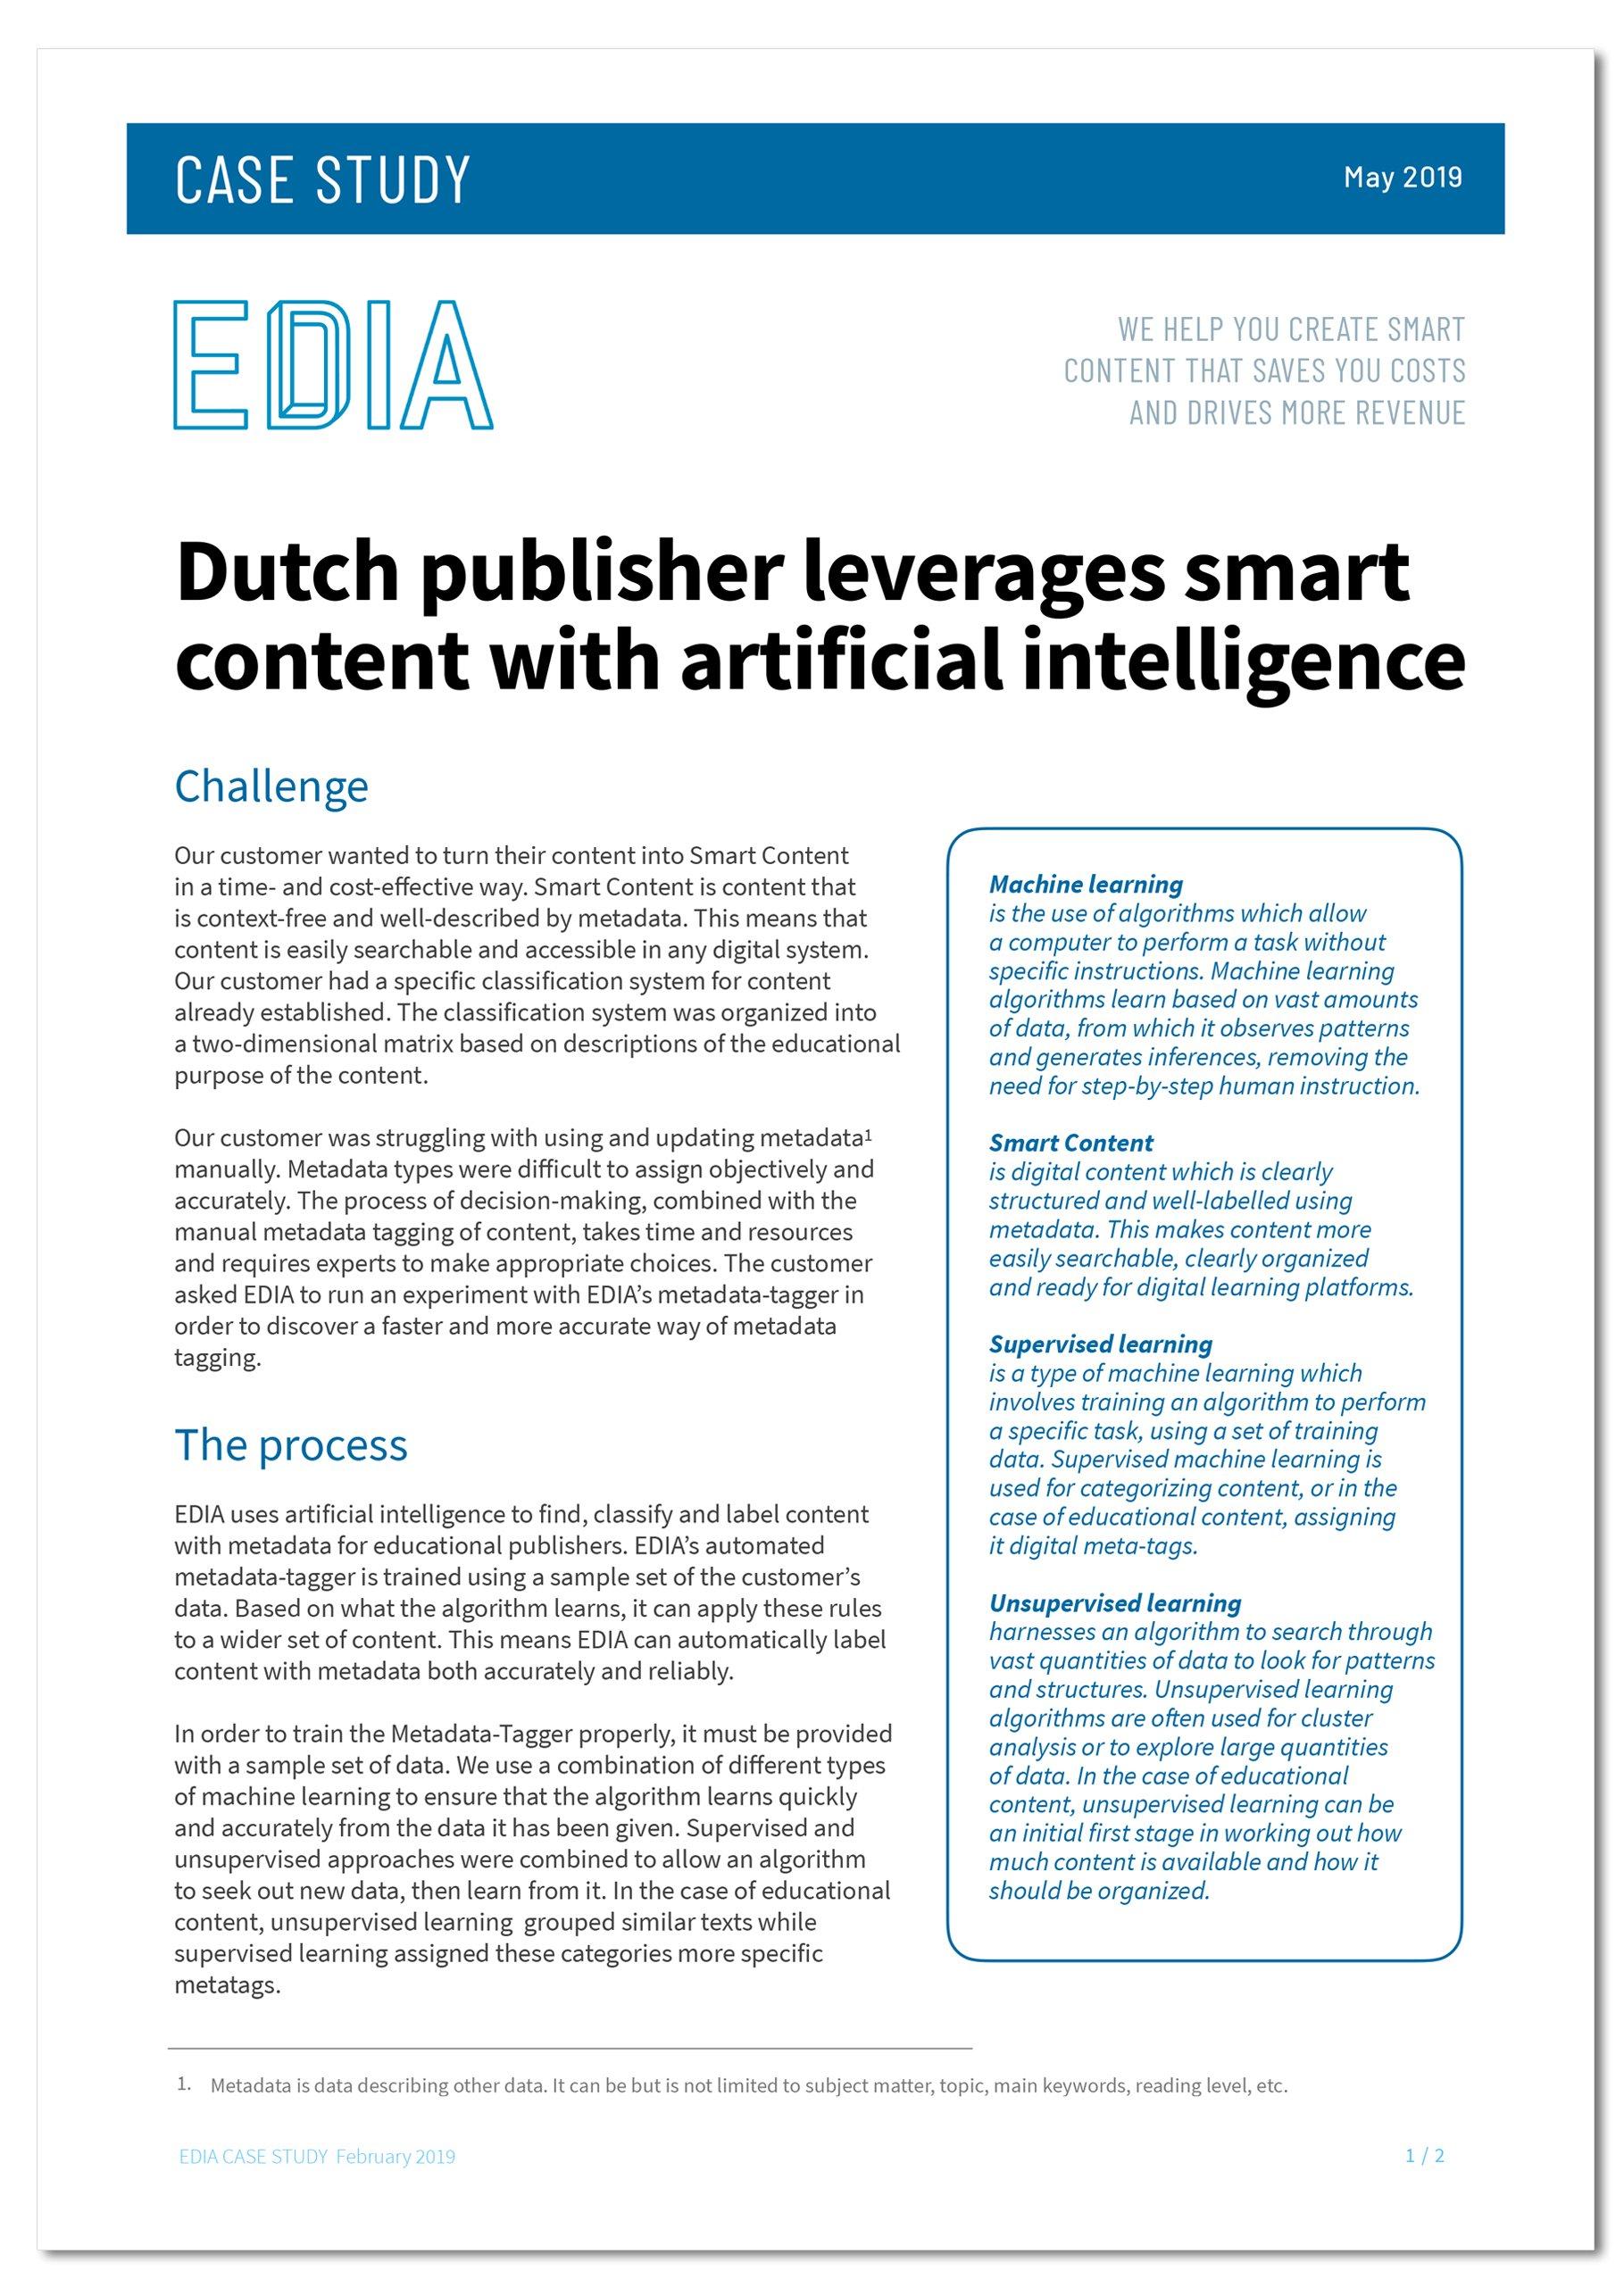 Dutch Publisher case study for website link